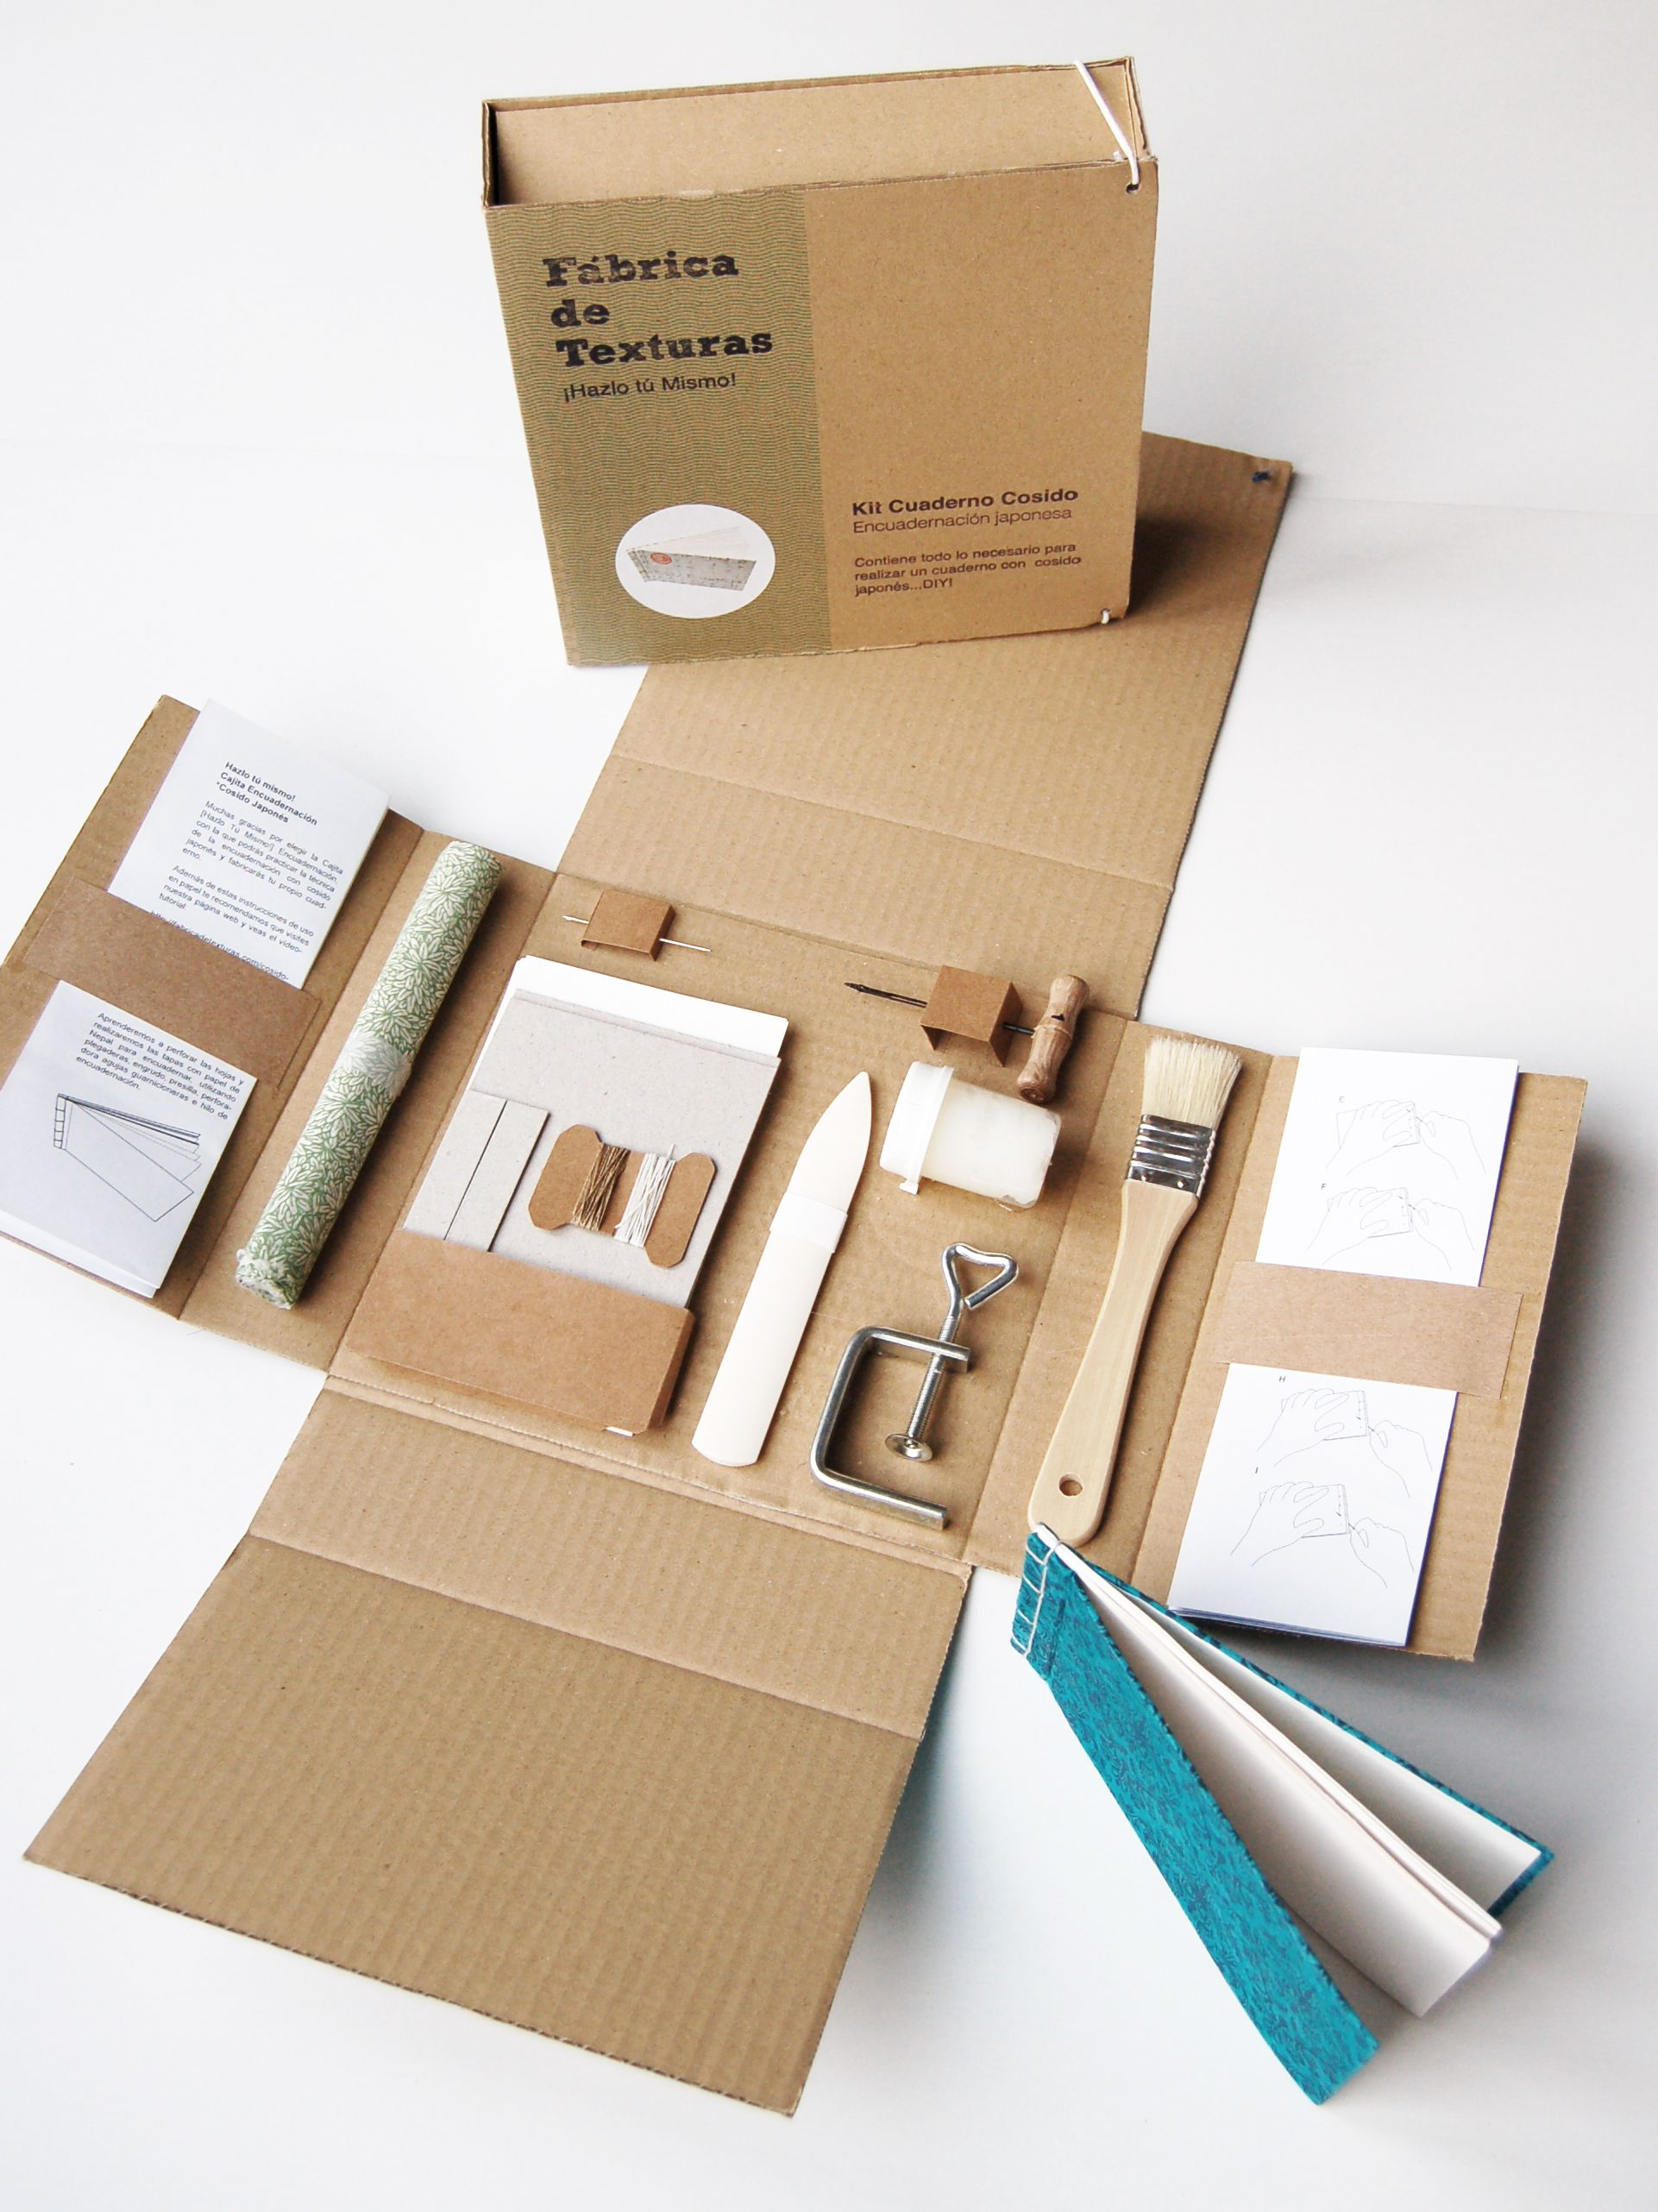 japanese bookbinding kit http//www.fabricadetexturas